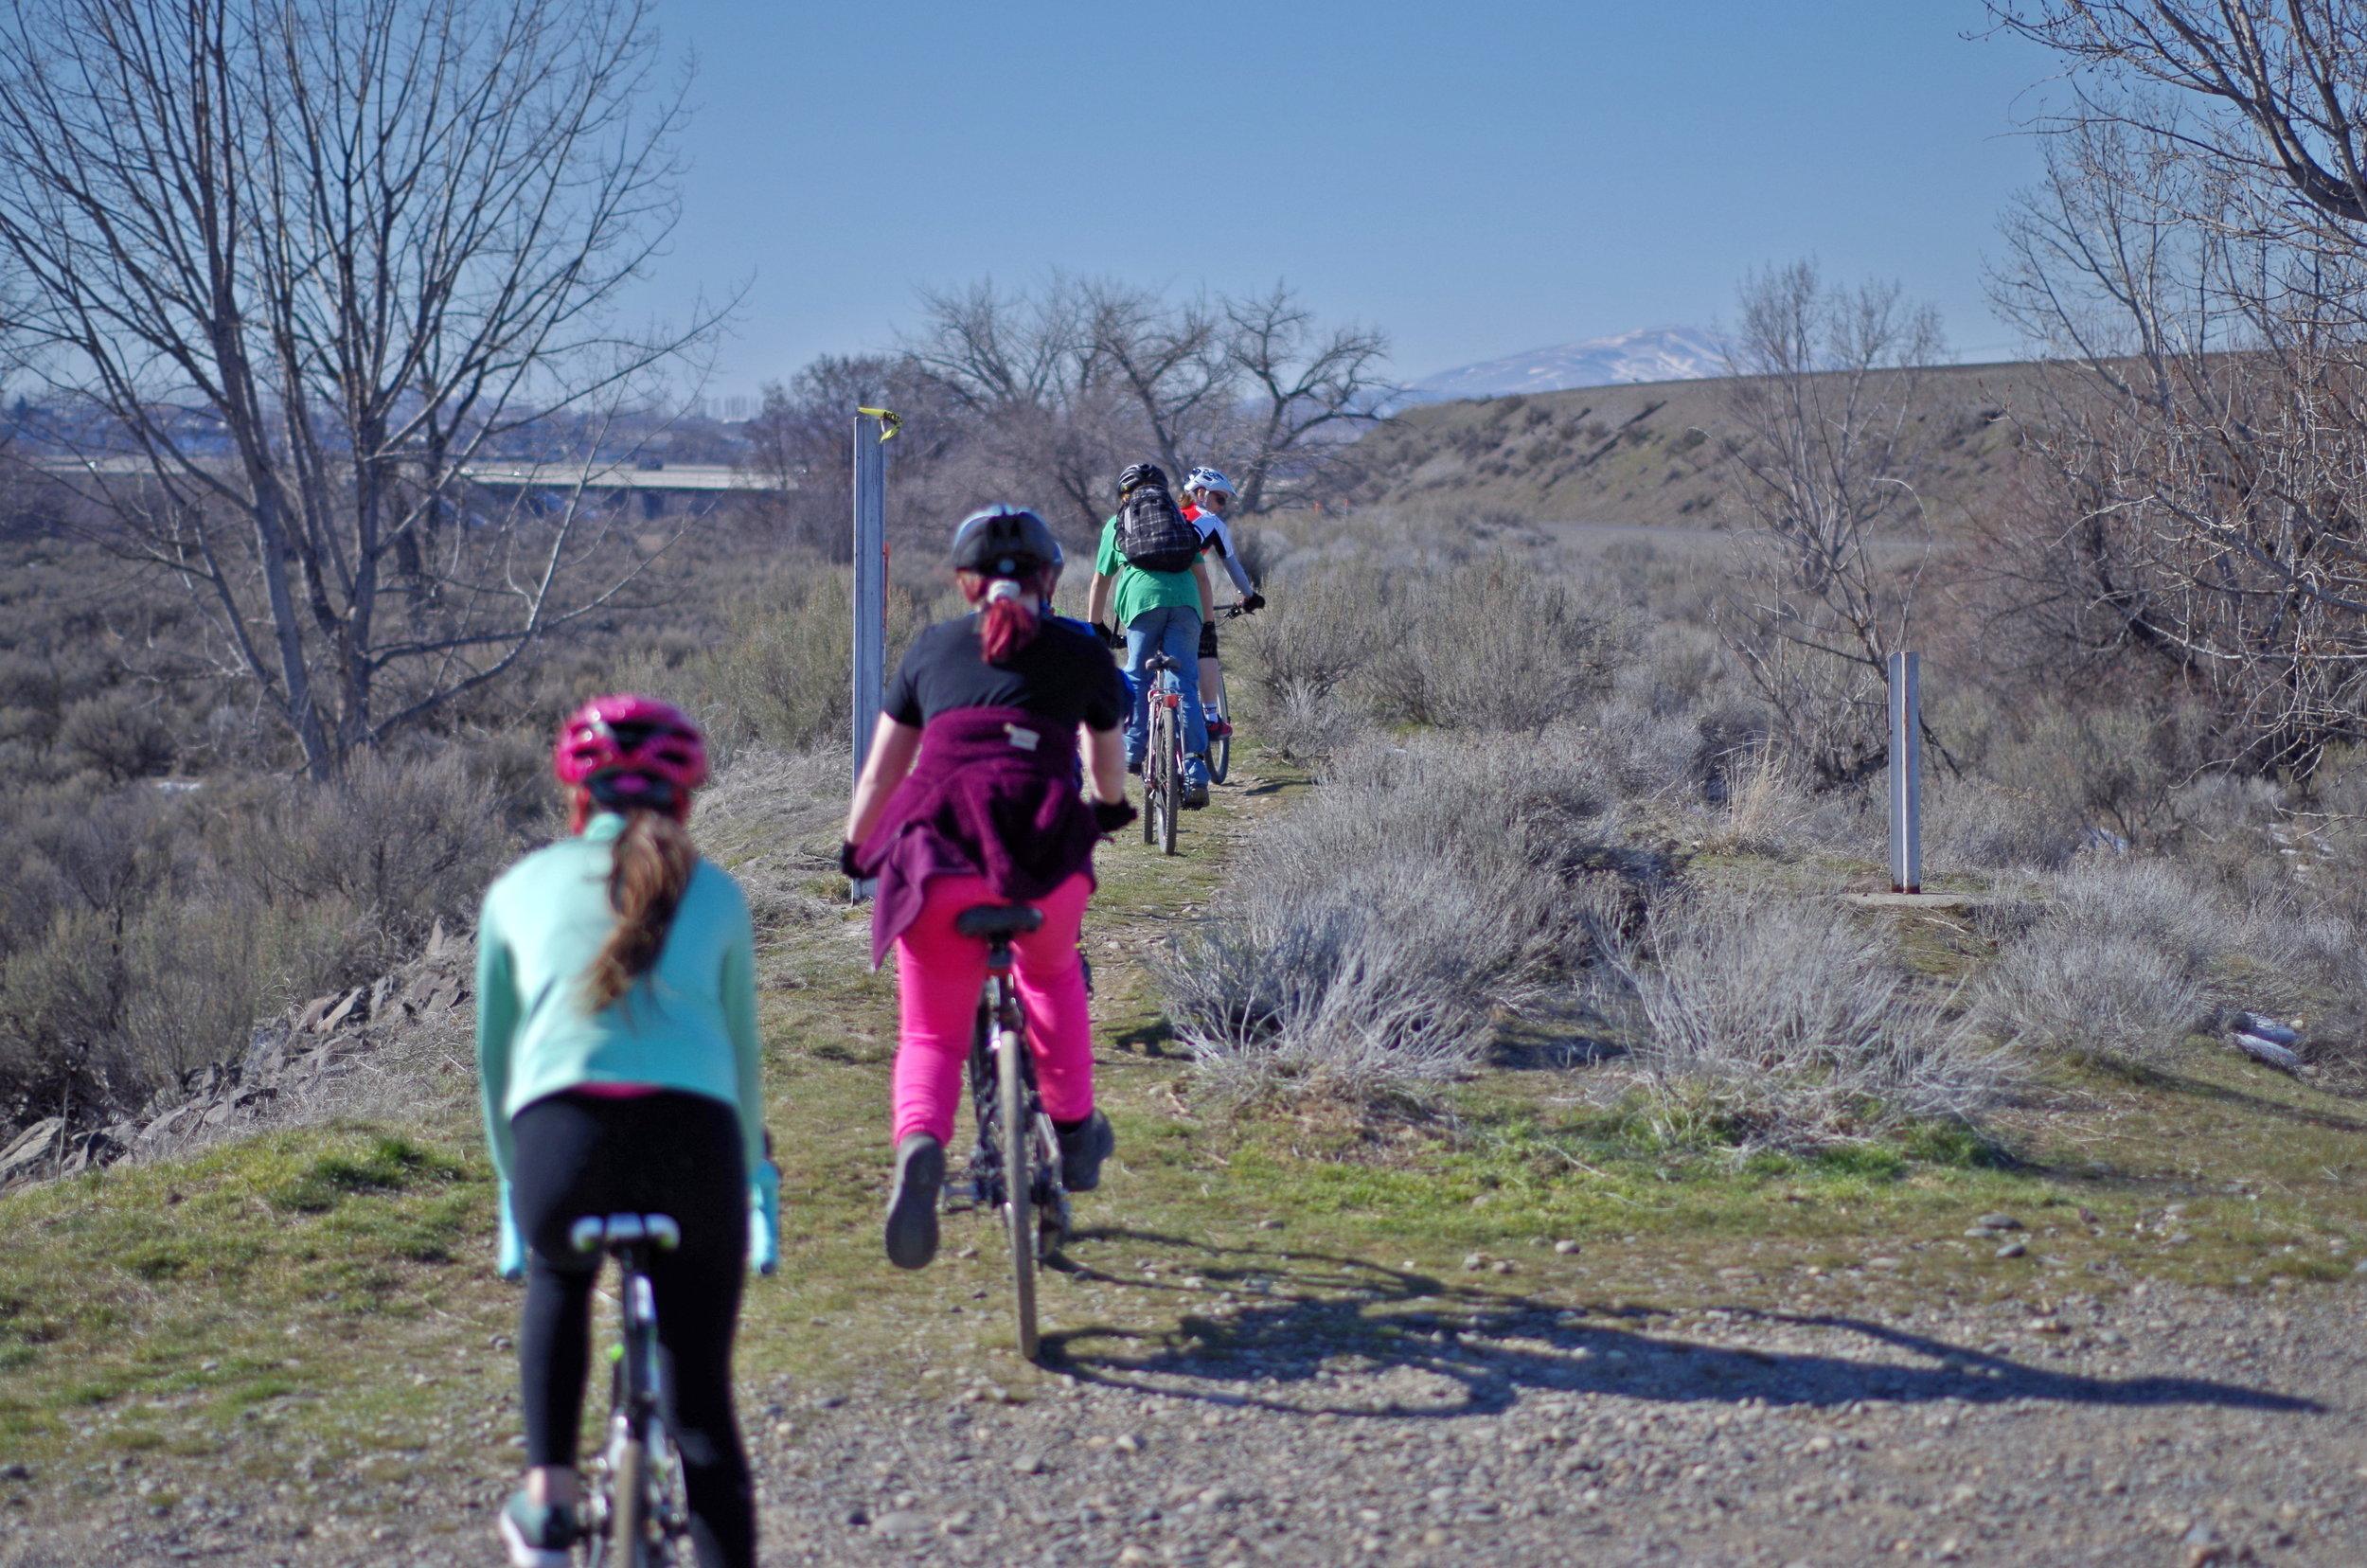 MidColumbia_RidinginLine_March2019.JPG